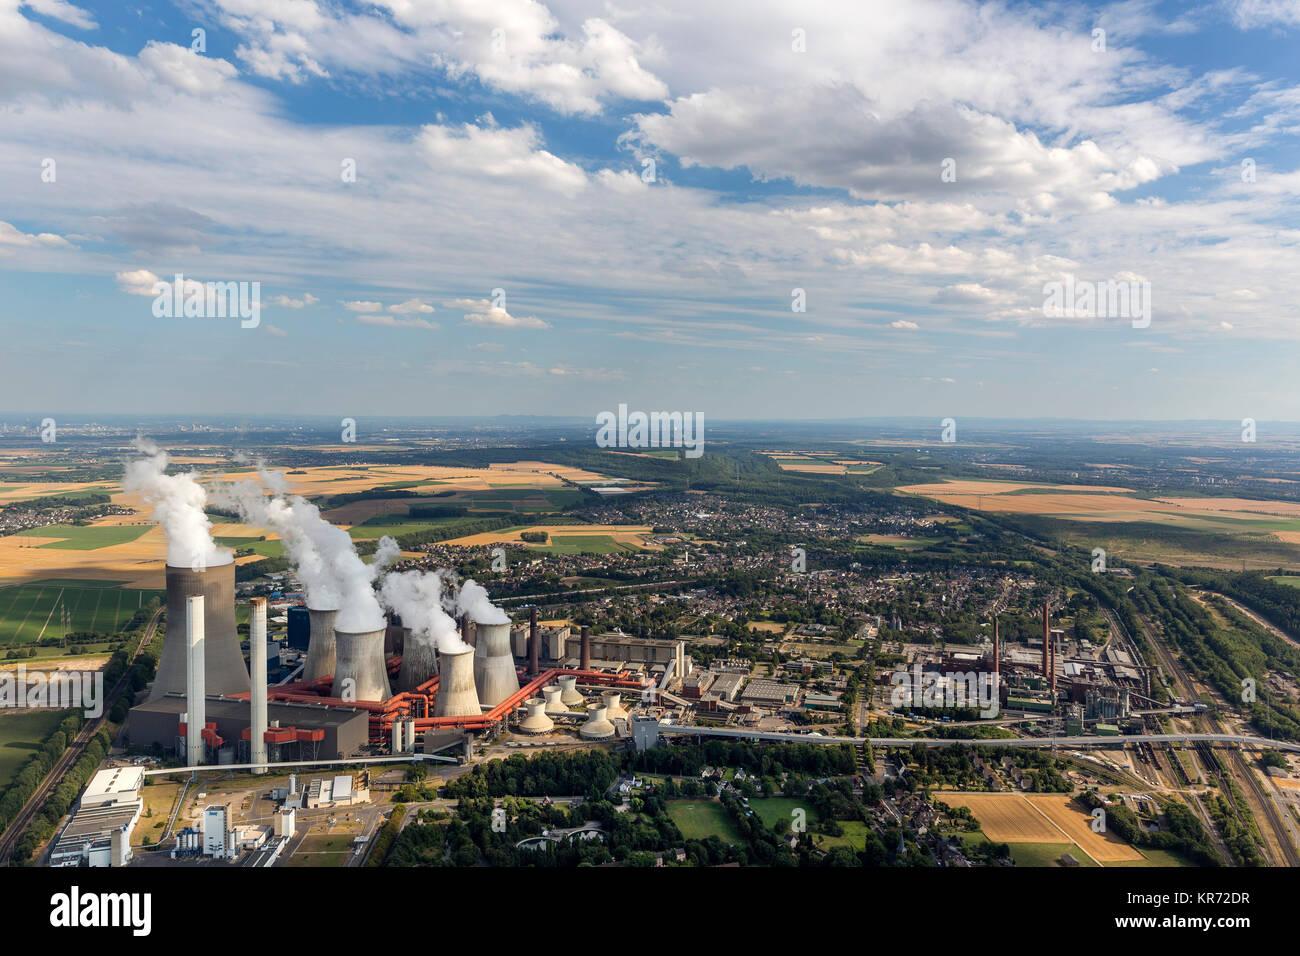 Kraftwerk Niederaussem, RWE Power, power generation, brown coal power station, base load power station chimneys, - Stock Image